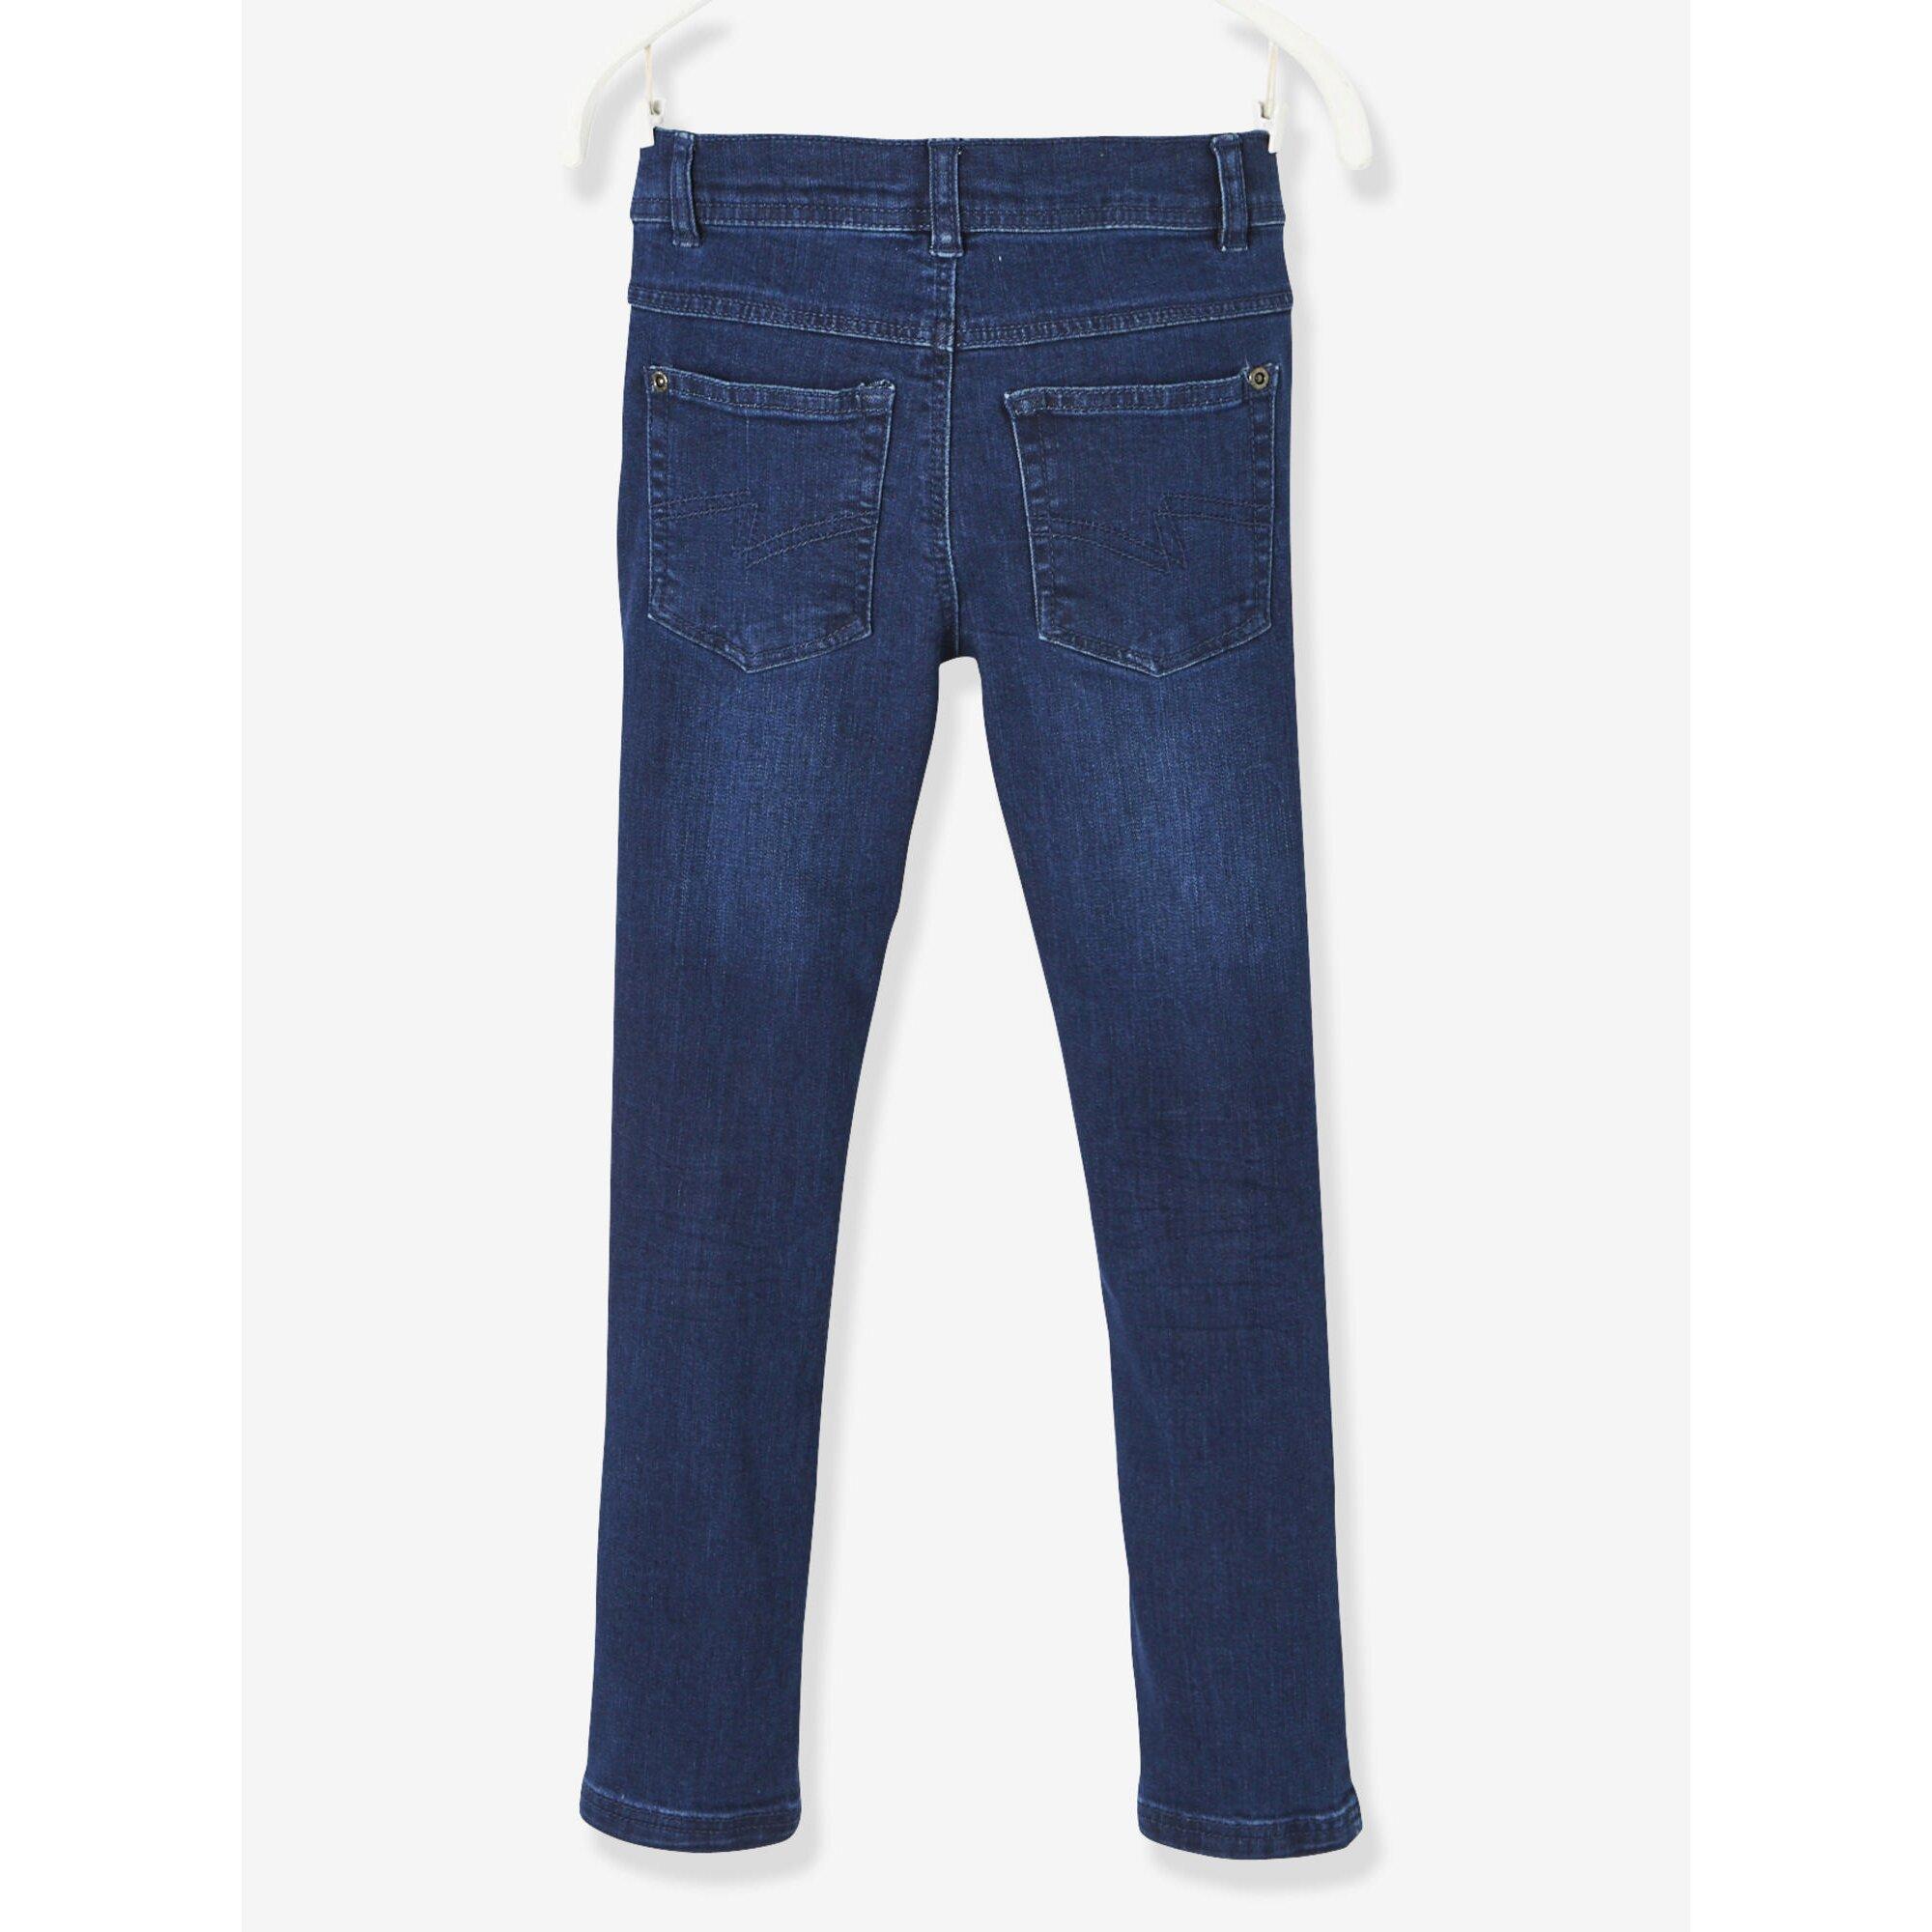 vertbaudet-jungen-jeans-stretch